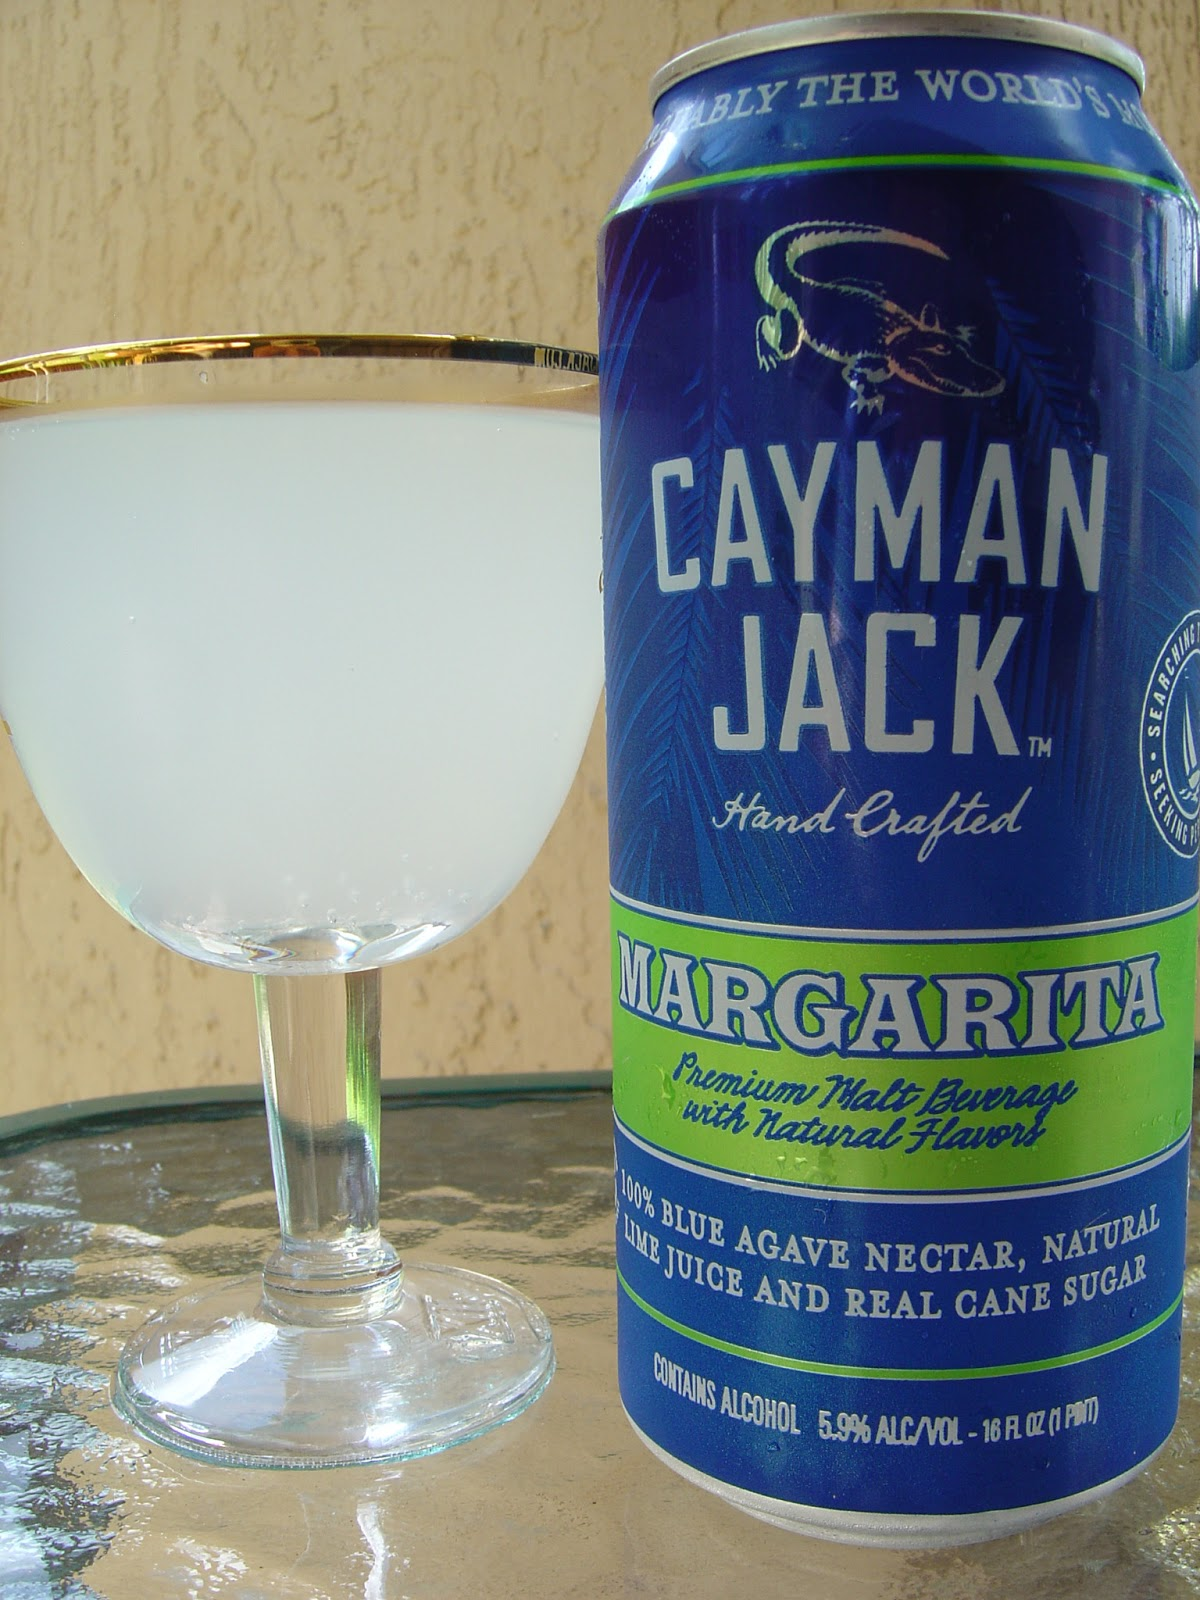 daily beer review: cayman jack margarita